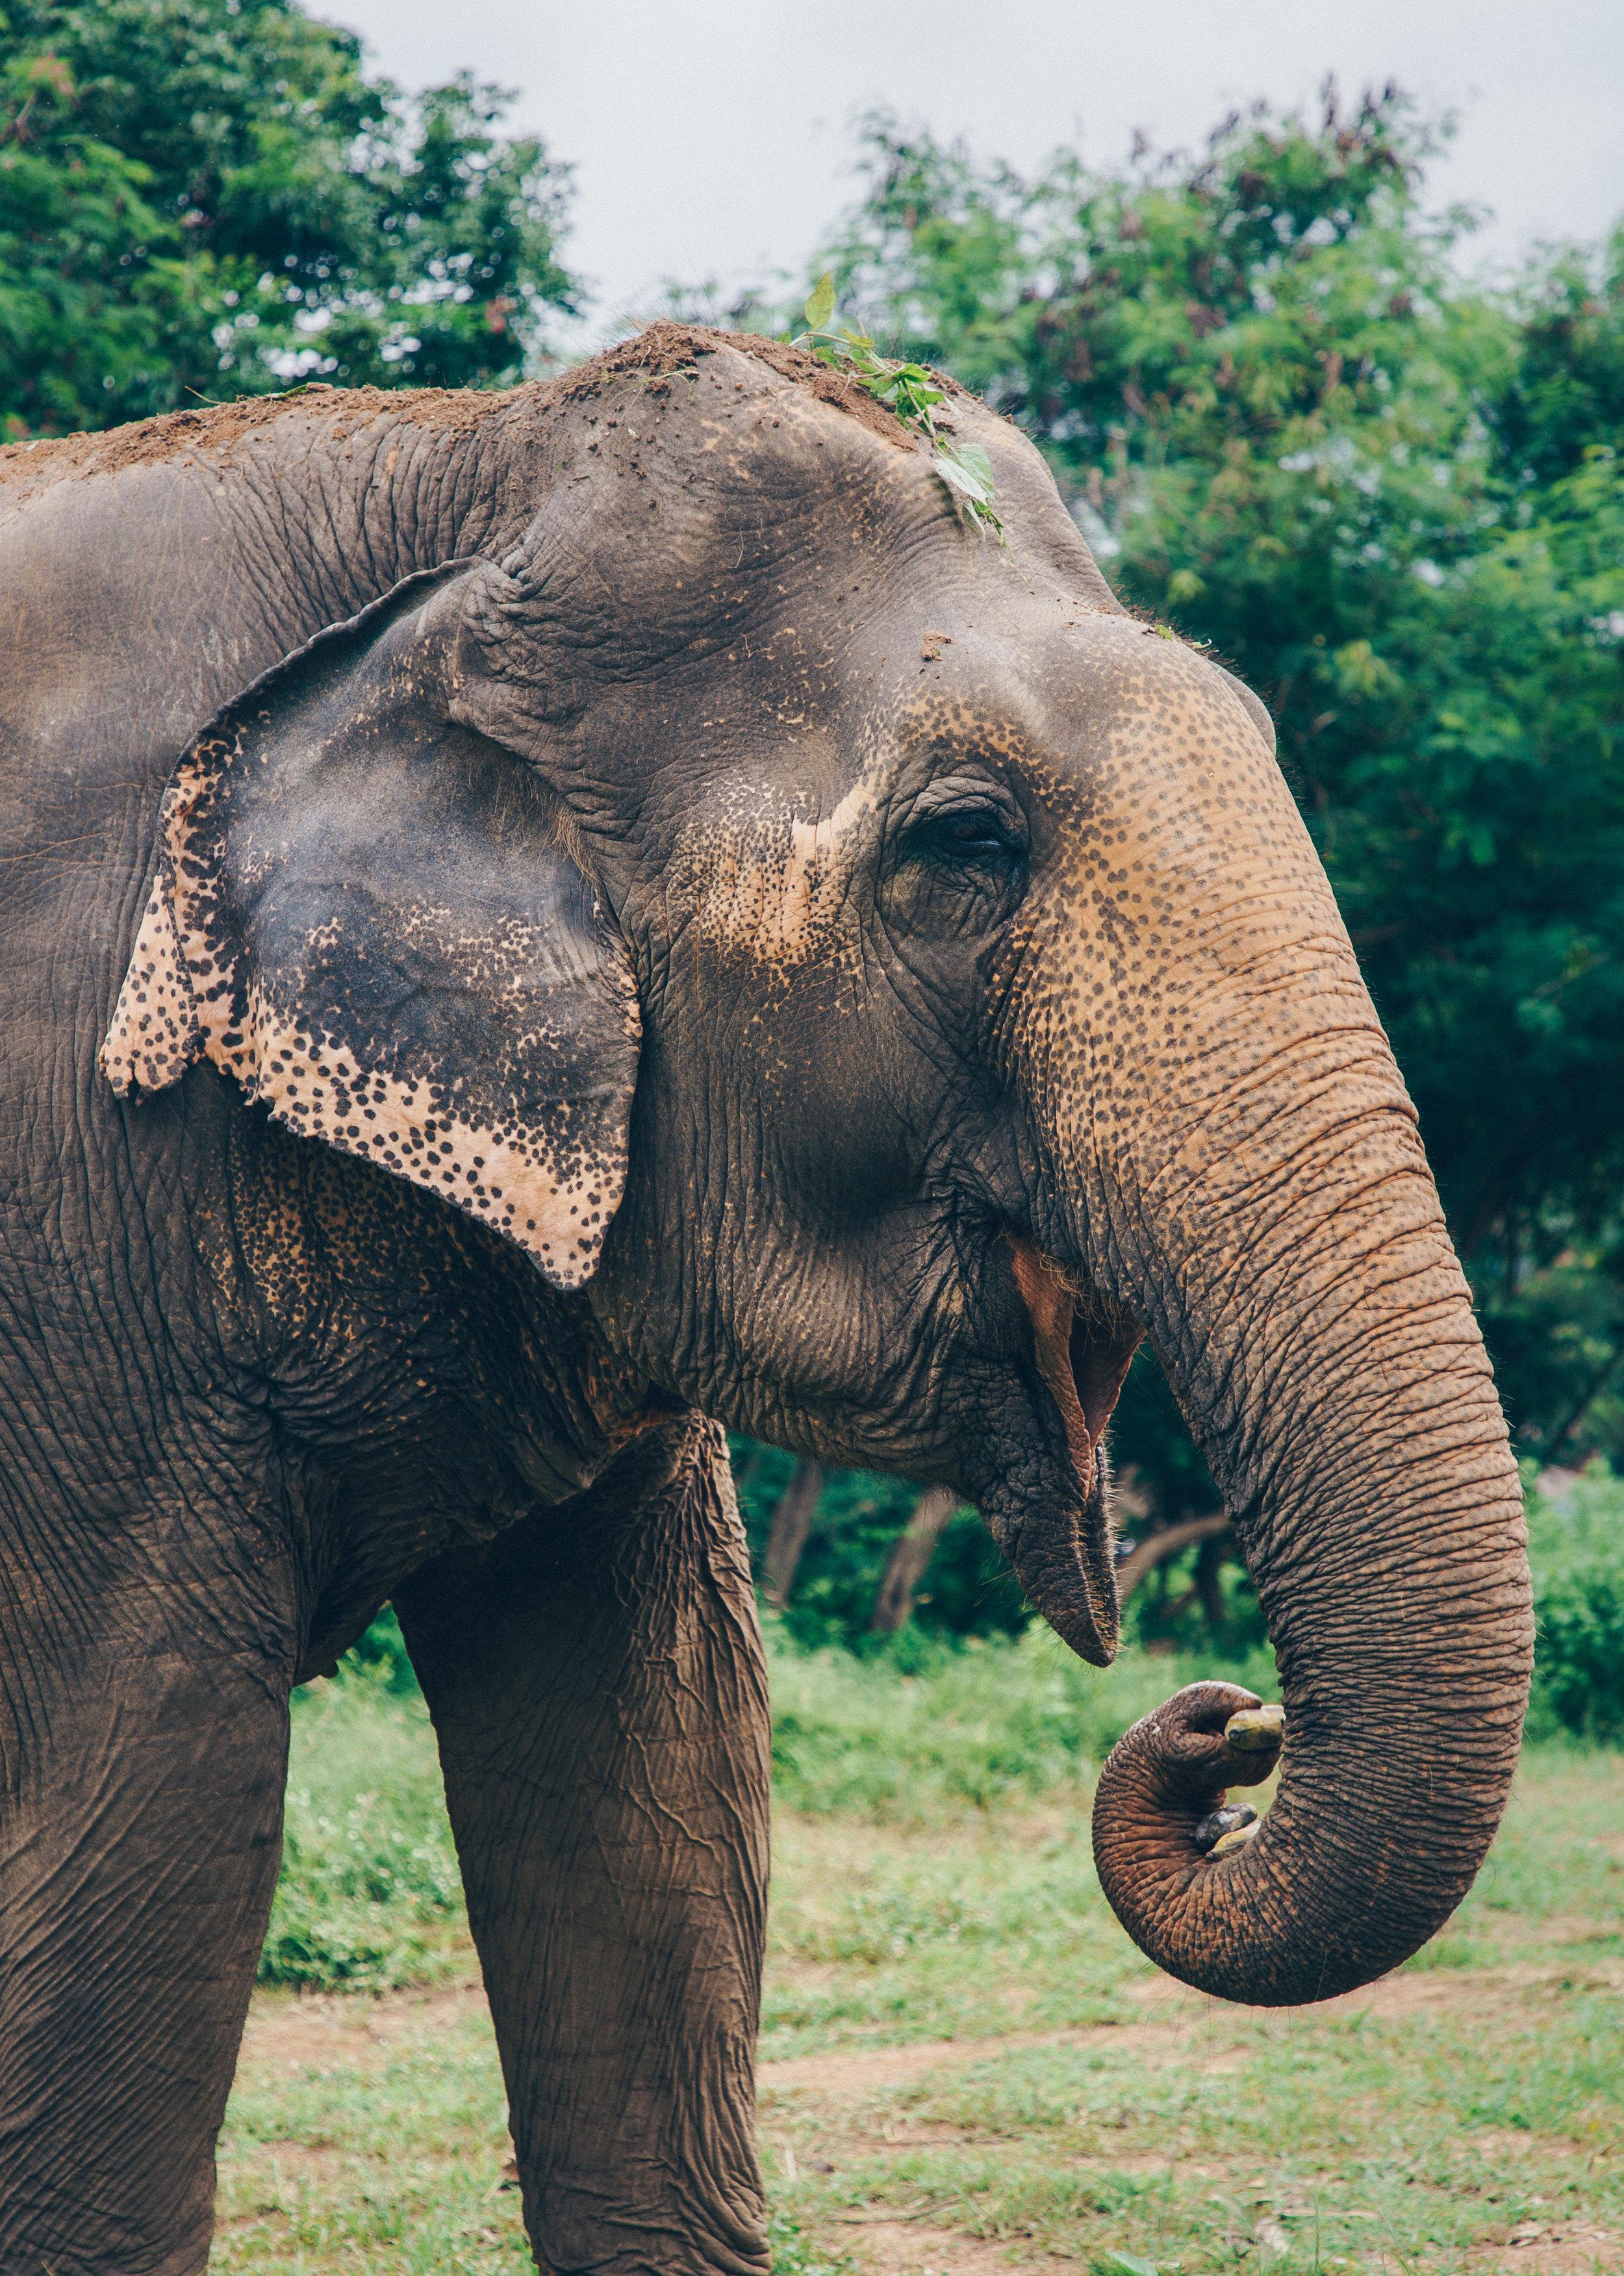 Elephant Sanctuary - Koh Samui, Thailand